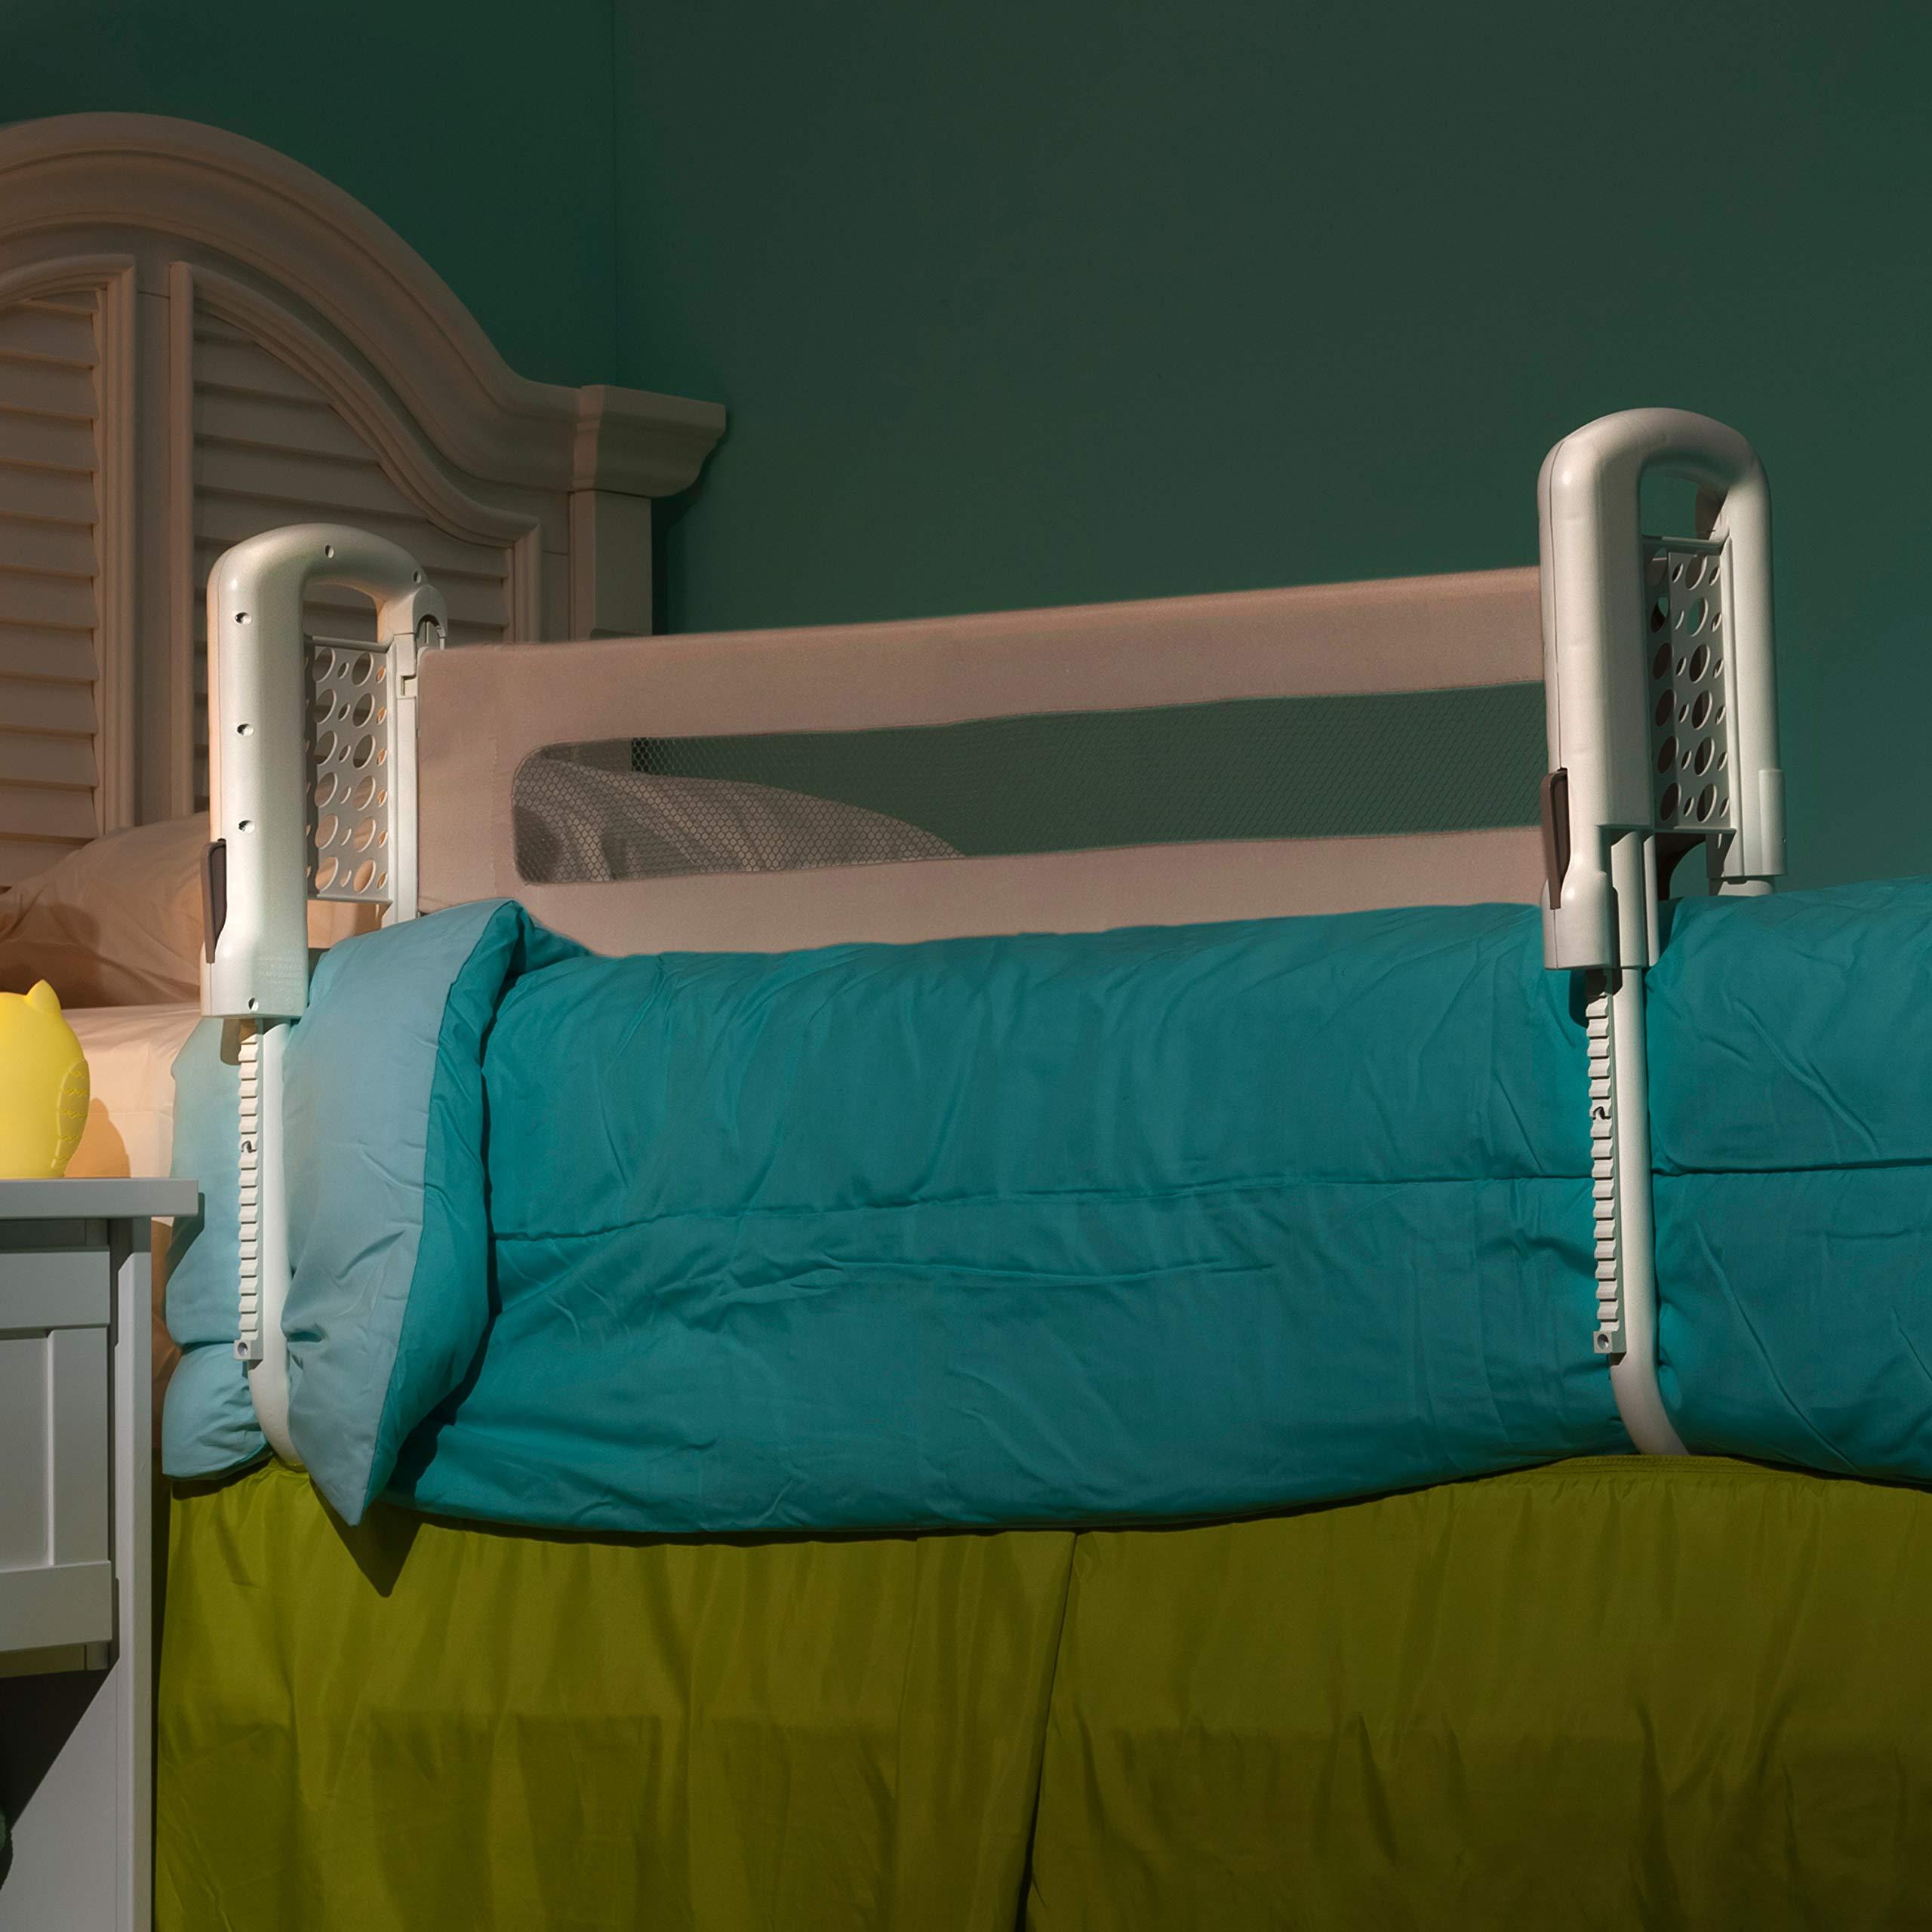 f887e8037 Safety 1st Top-of-mattress Bed Rail, Cream 885682046085 | eBay